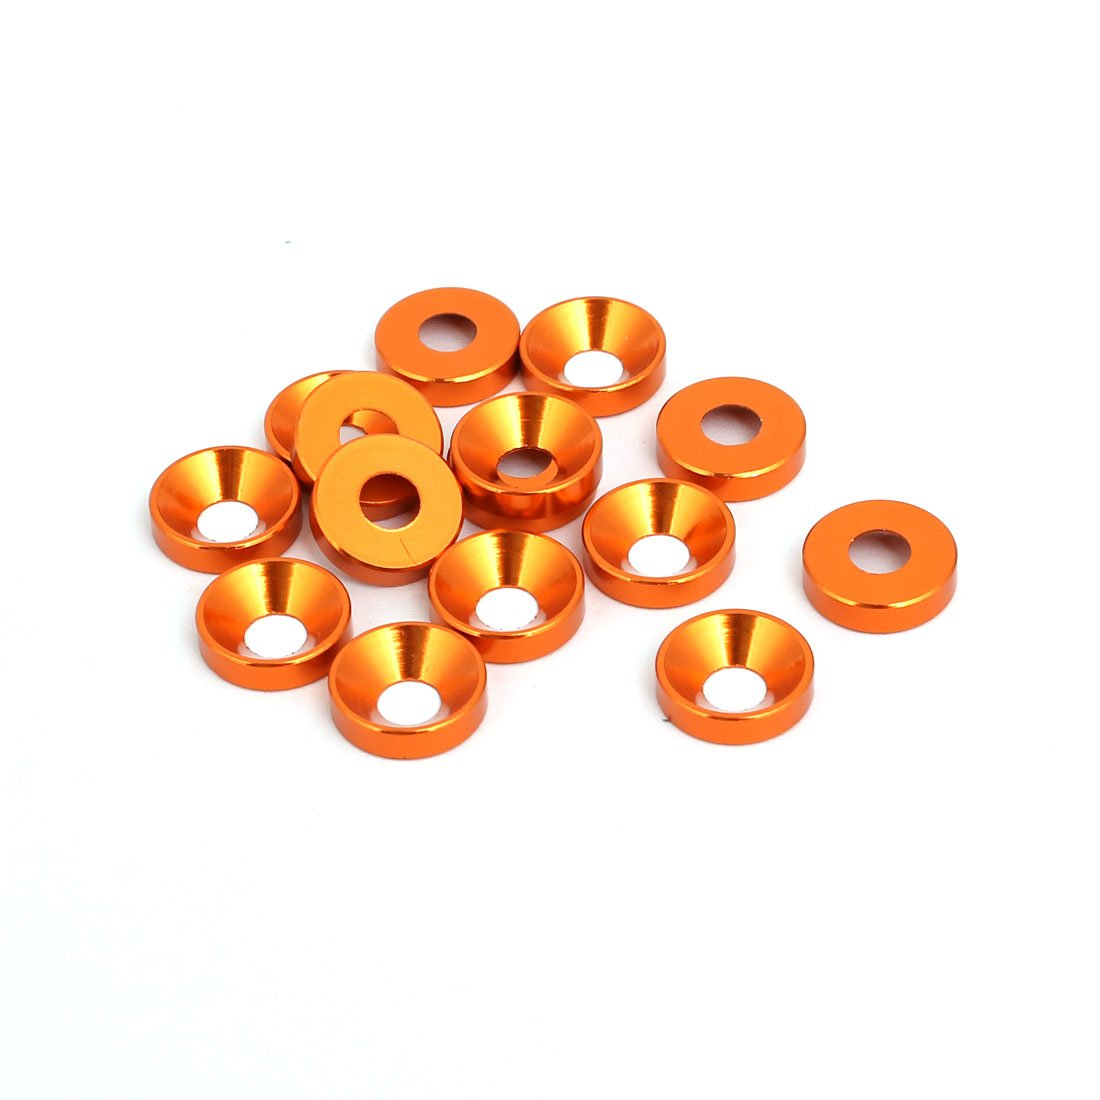 sourcingmap/® 15Stk M4 Aluminium Legierung Tasse Motor Unterlegscheiben Sto/ßstange Orange DE de